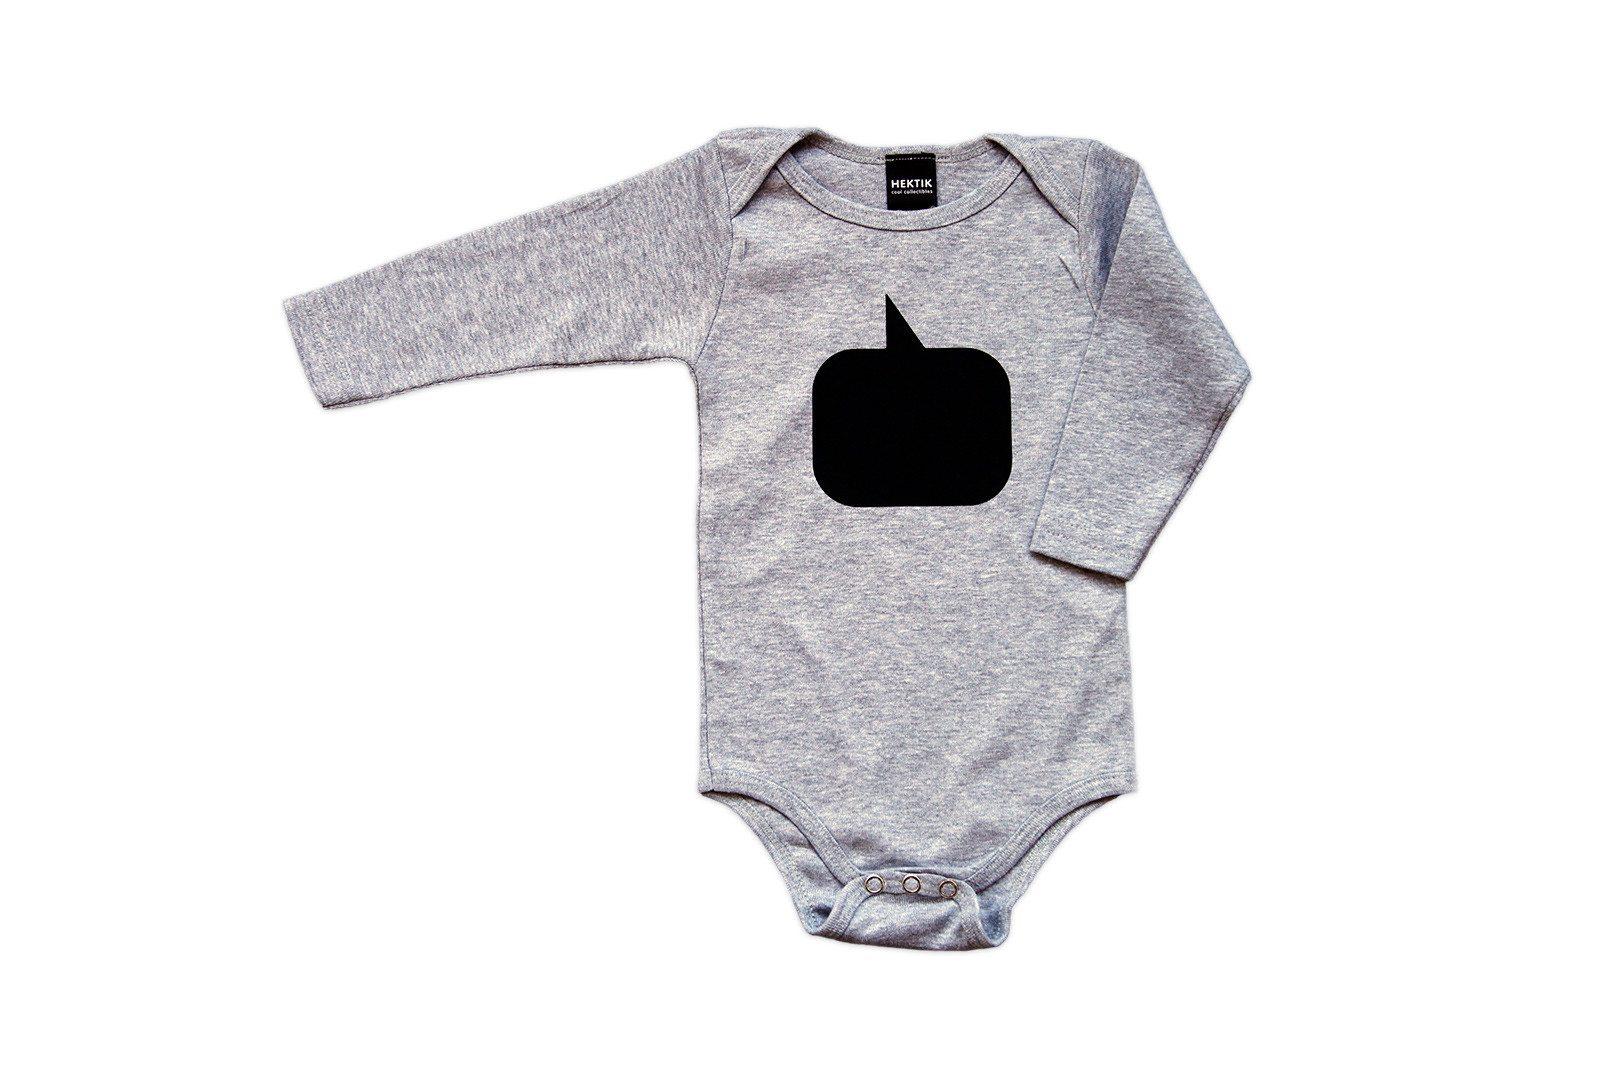 Beschrijfbaar babypakje - leuk kraamcadeau